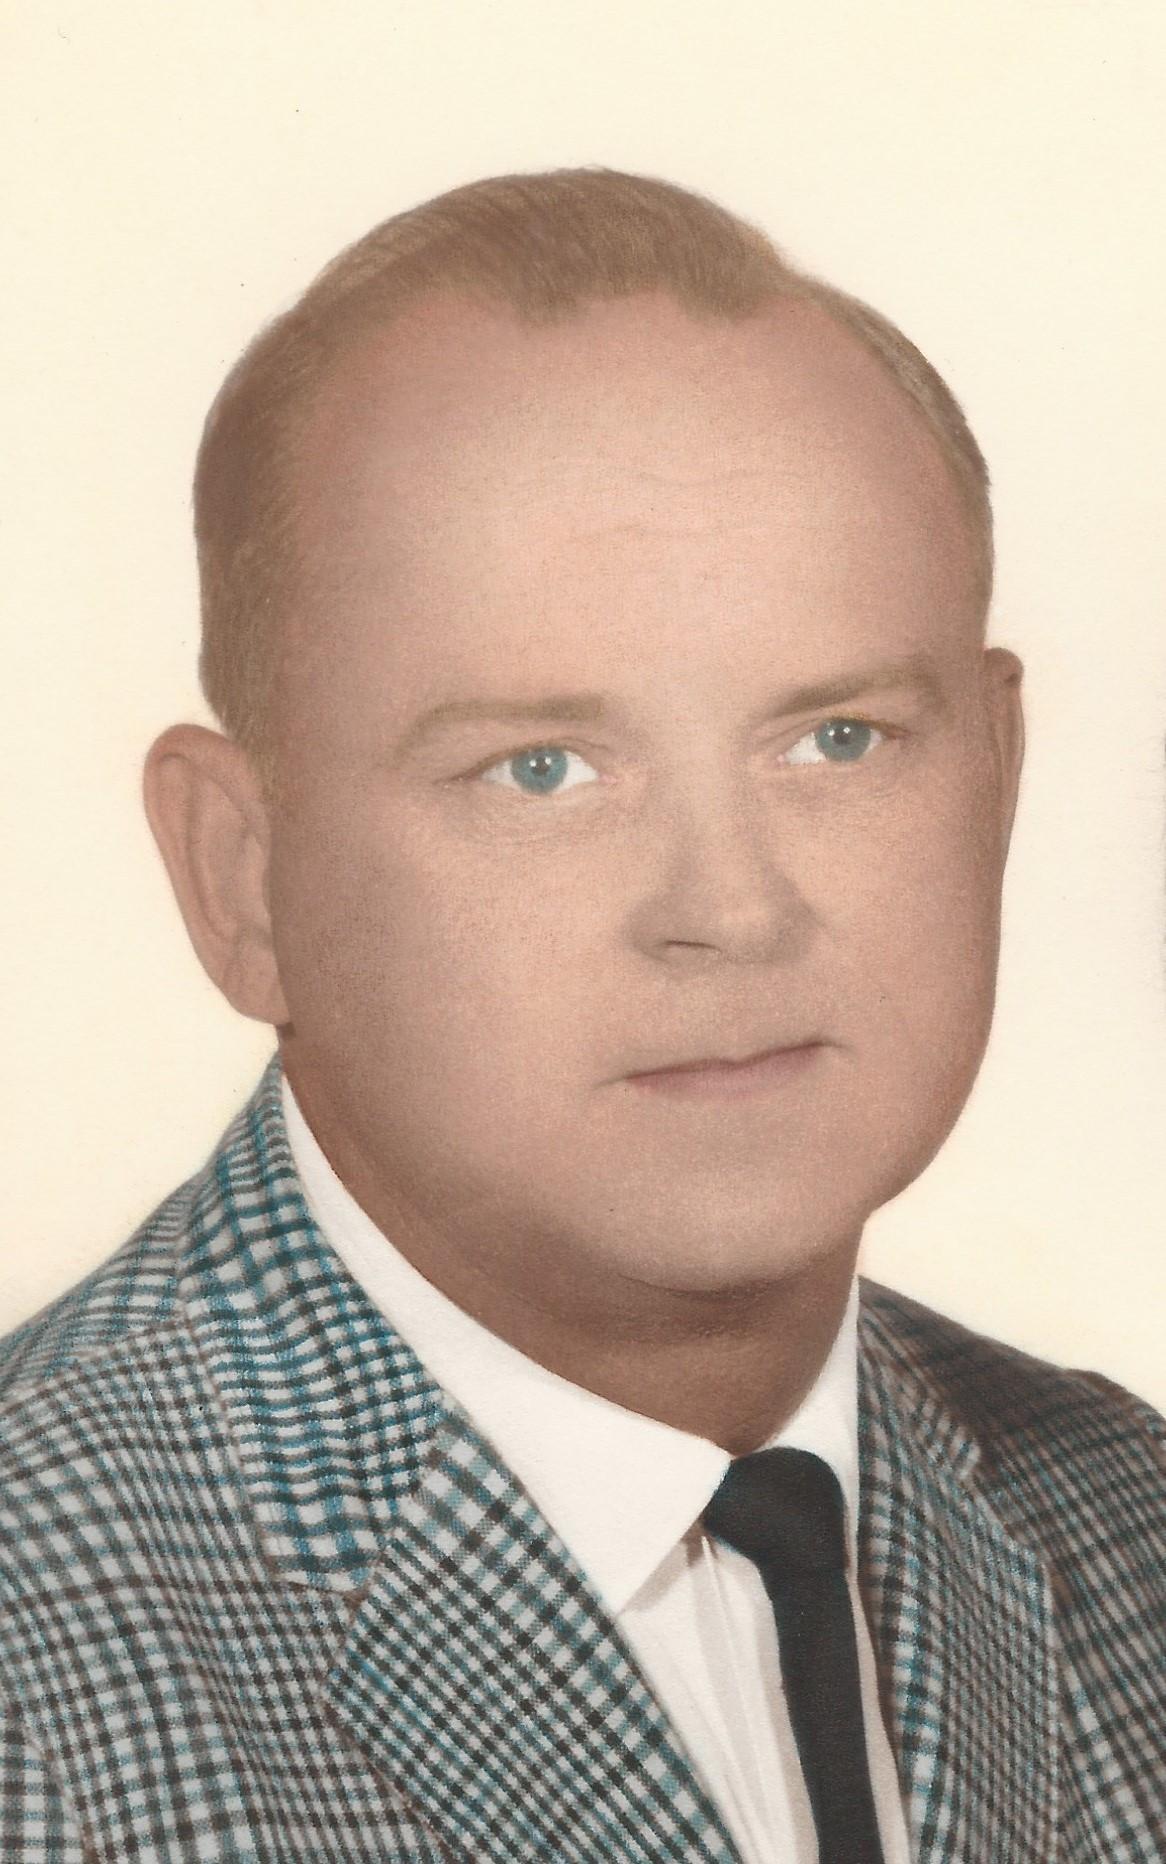 sympathy cross vase of hershel crist obituary herald bulletin with eyjoijoxody0lcj3ijoxmty2lcj1cmwioijodhrwolwvxc9hzgfzlw9yzwdvbi1jyxmtb2jpdhmuczmuyw1hem9uyxdzlmnvbvwvcghvdg9zxc9jcmvhdgvfc3rvcnlclzviyzuwmjjiotq5zjfclzmyzmzjmmy2yzhiodhjytm5mgm1nmi5nmnjn2euanbnin0